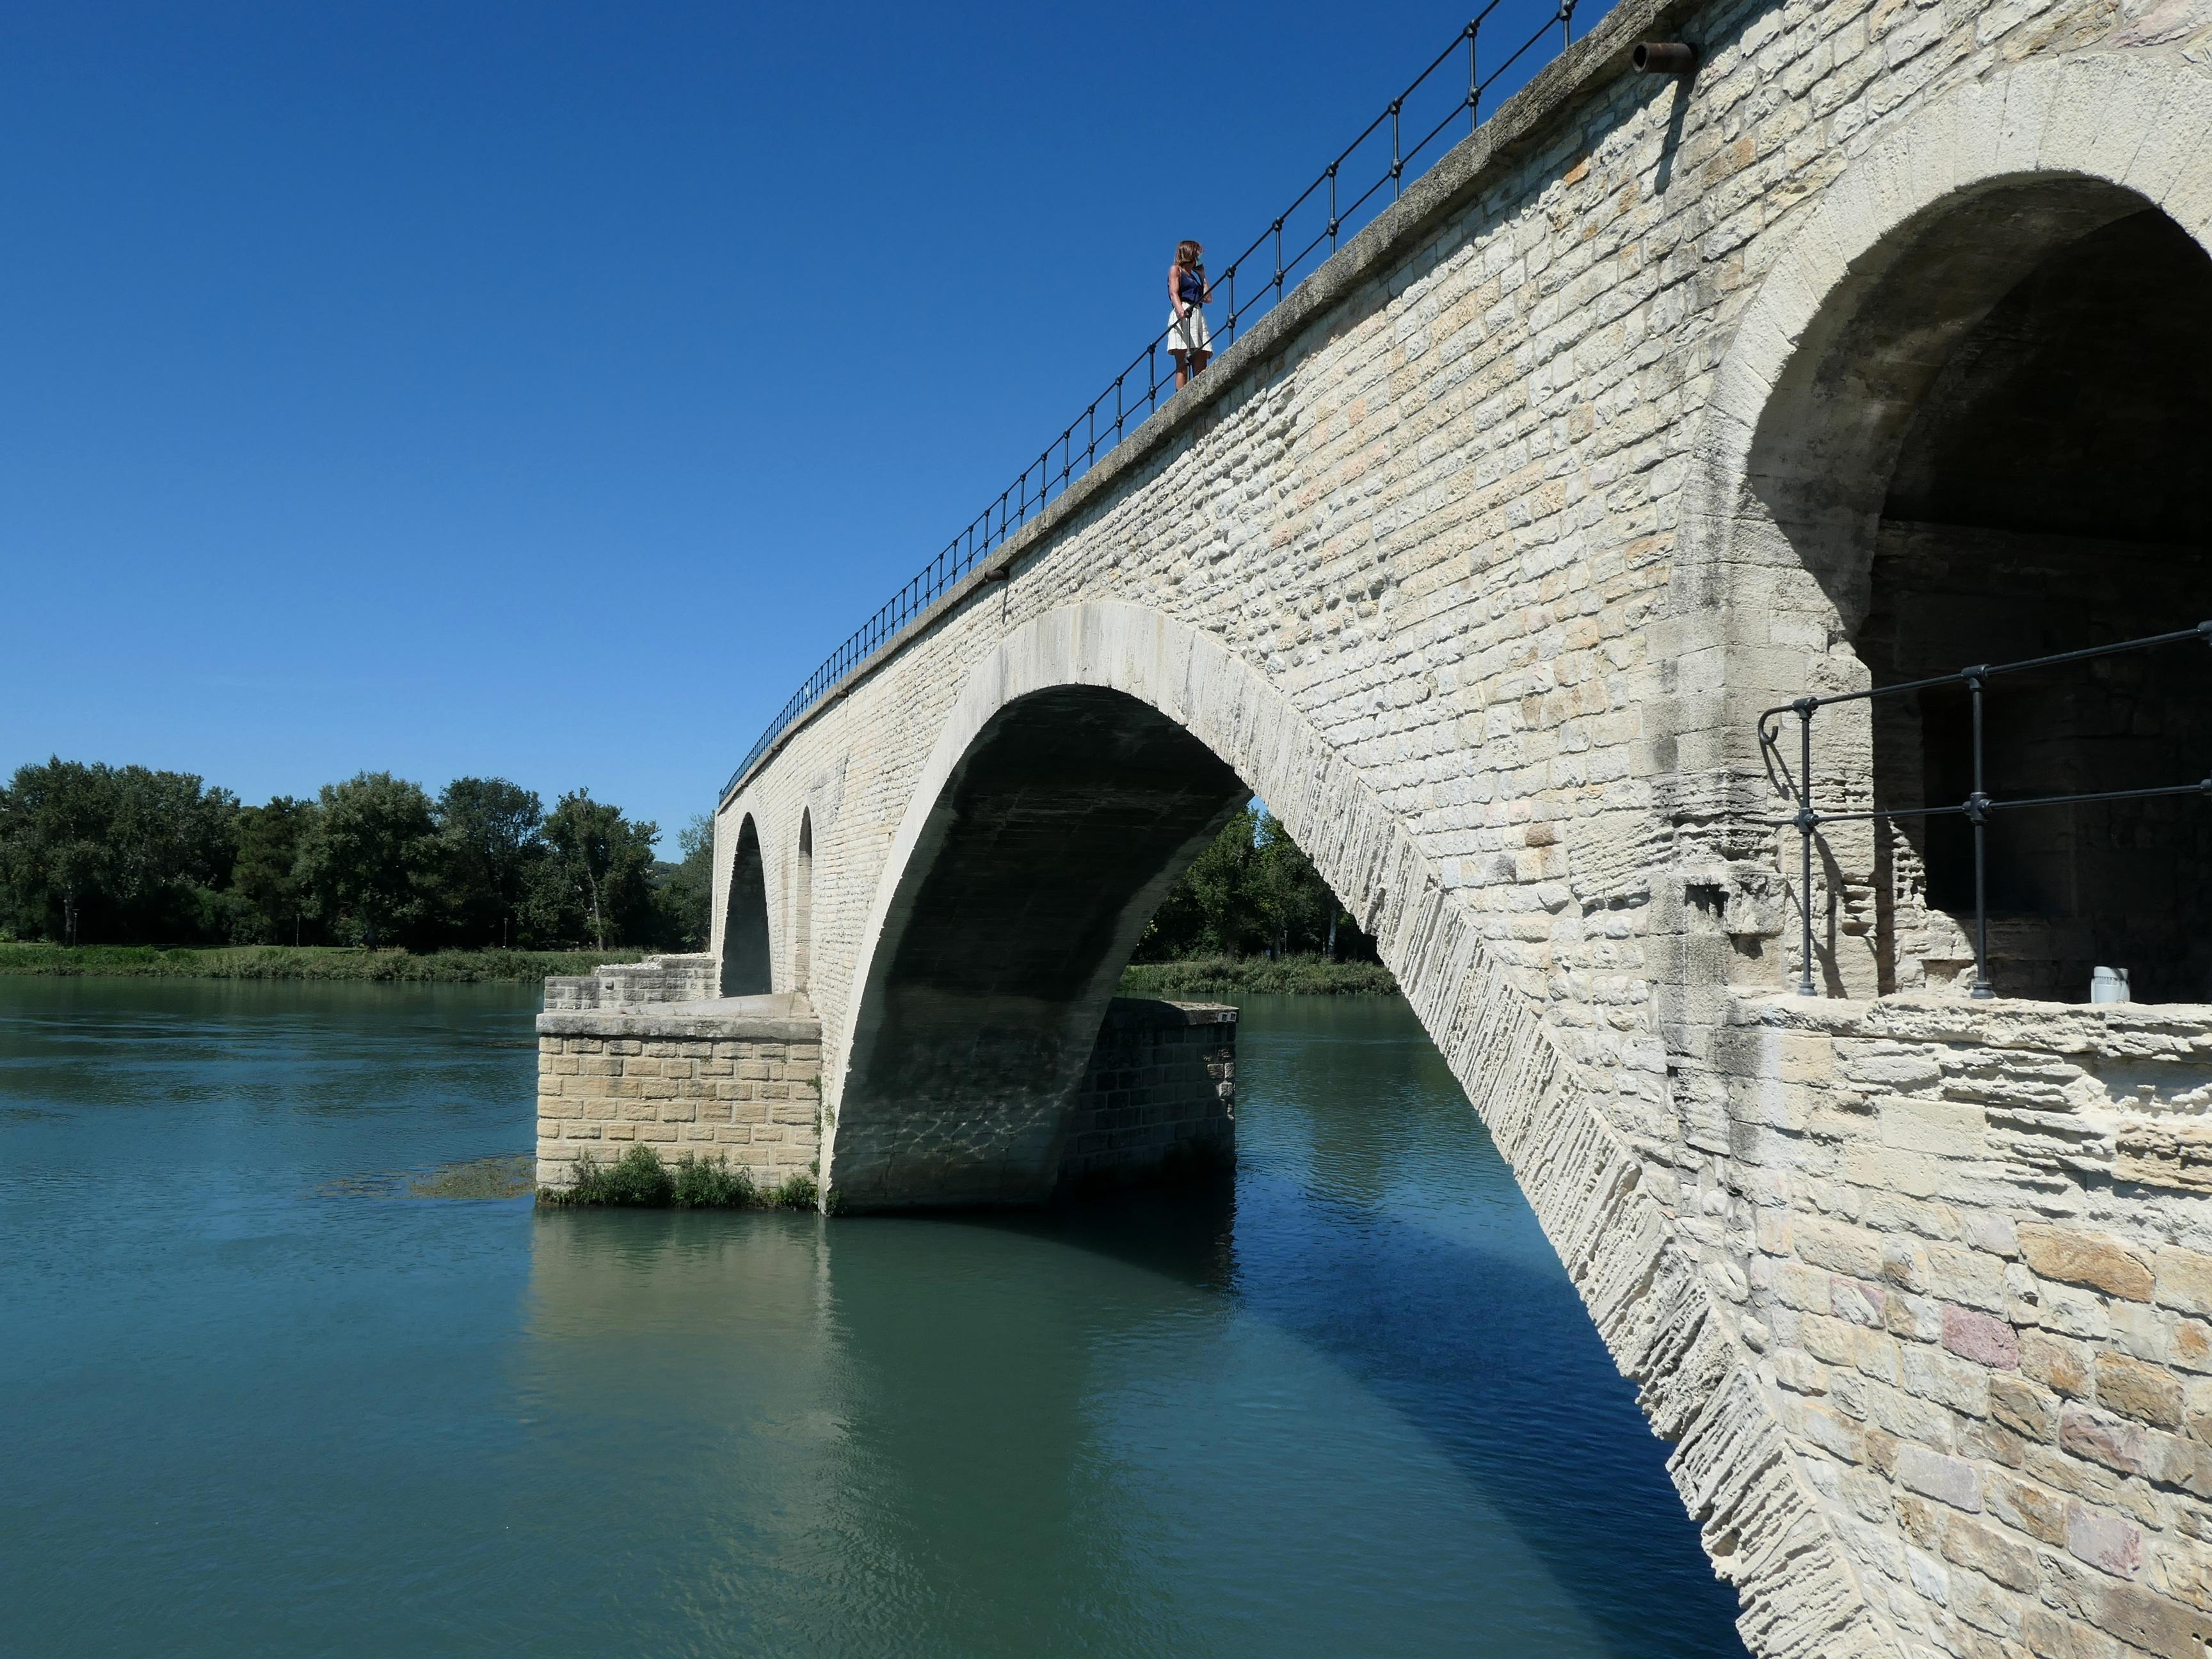 Visiter Avignon un week-end